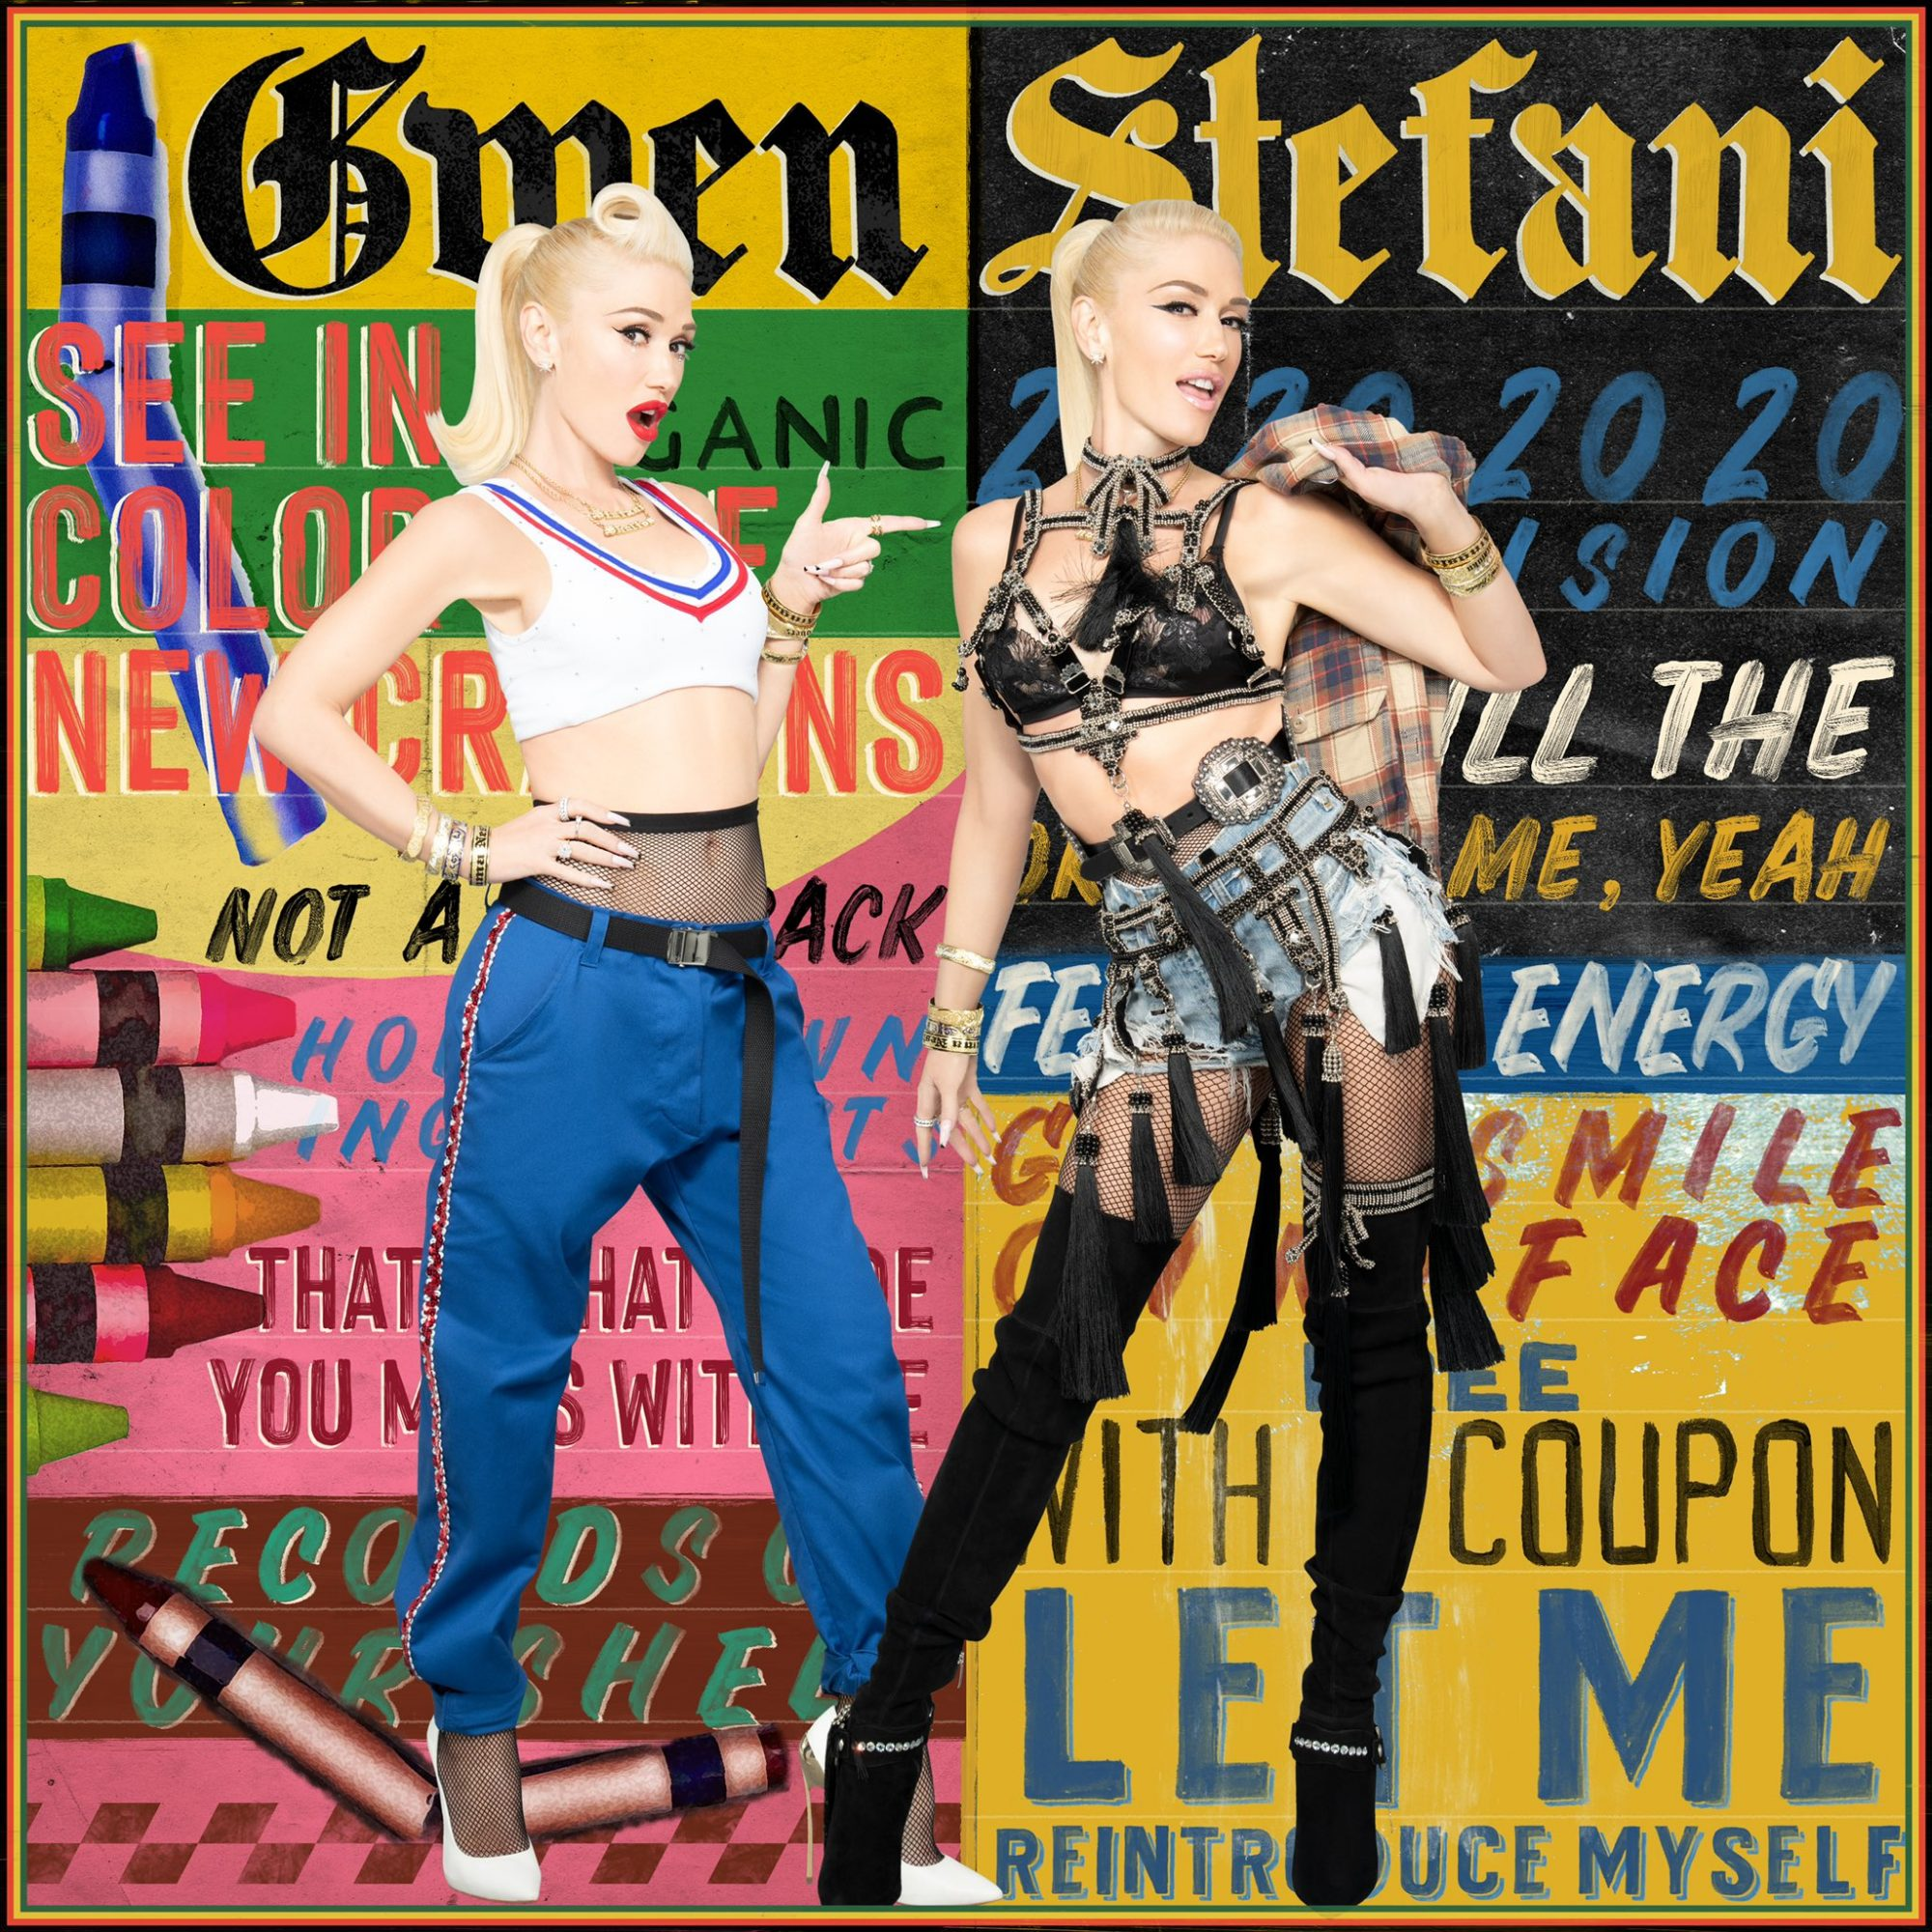 LET ME REINTRODUCE MYSELF by Gwen Stefani